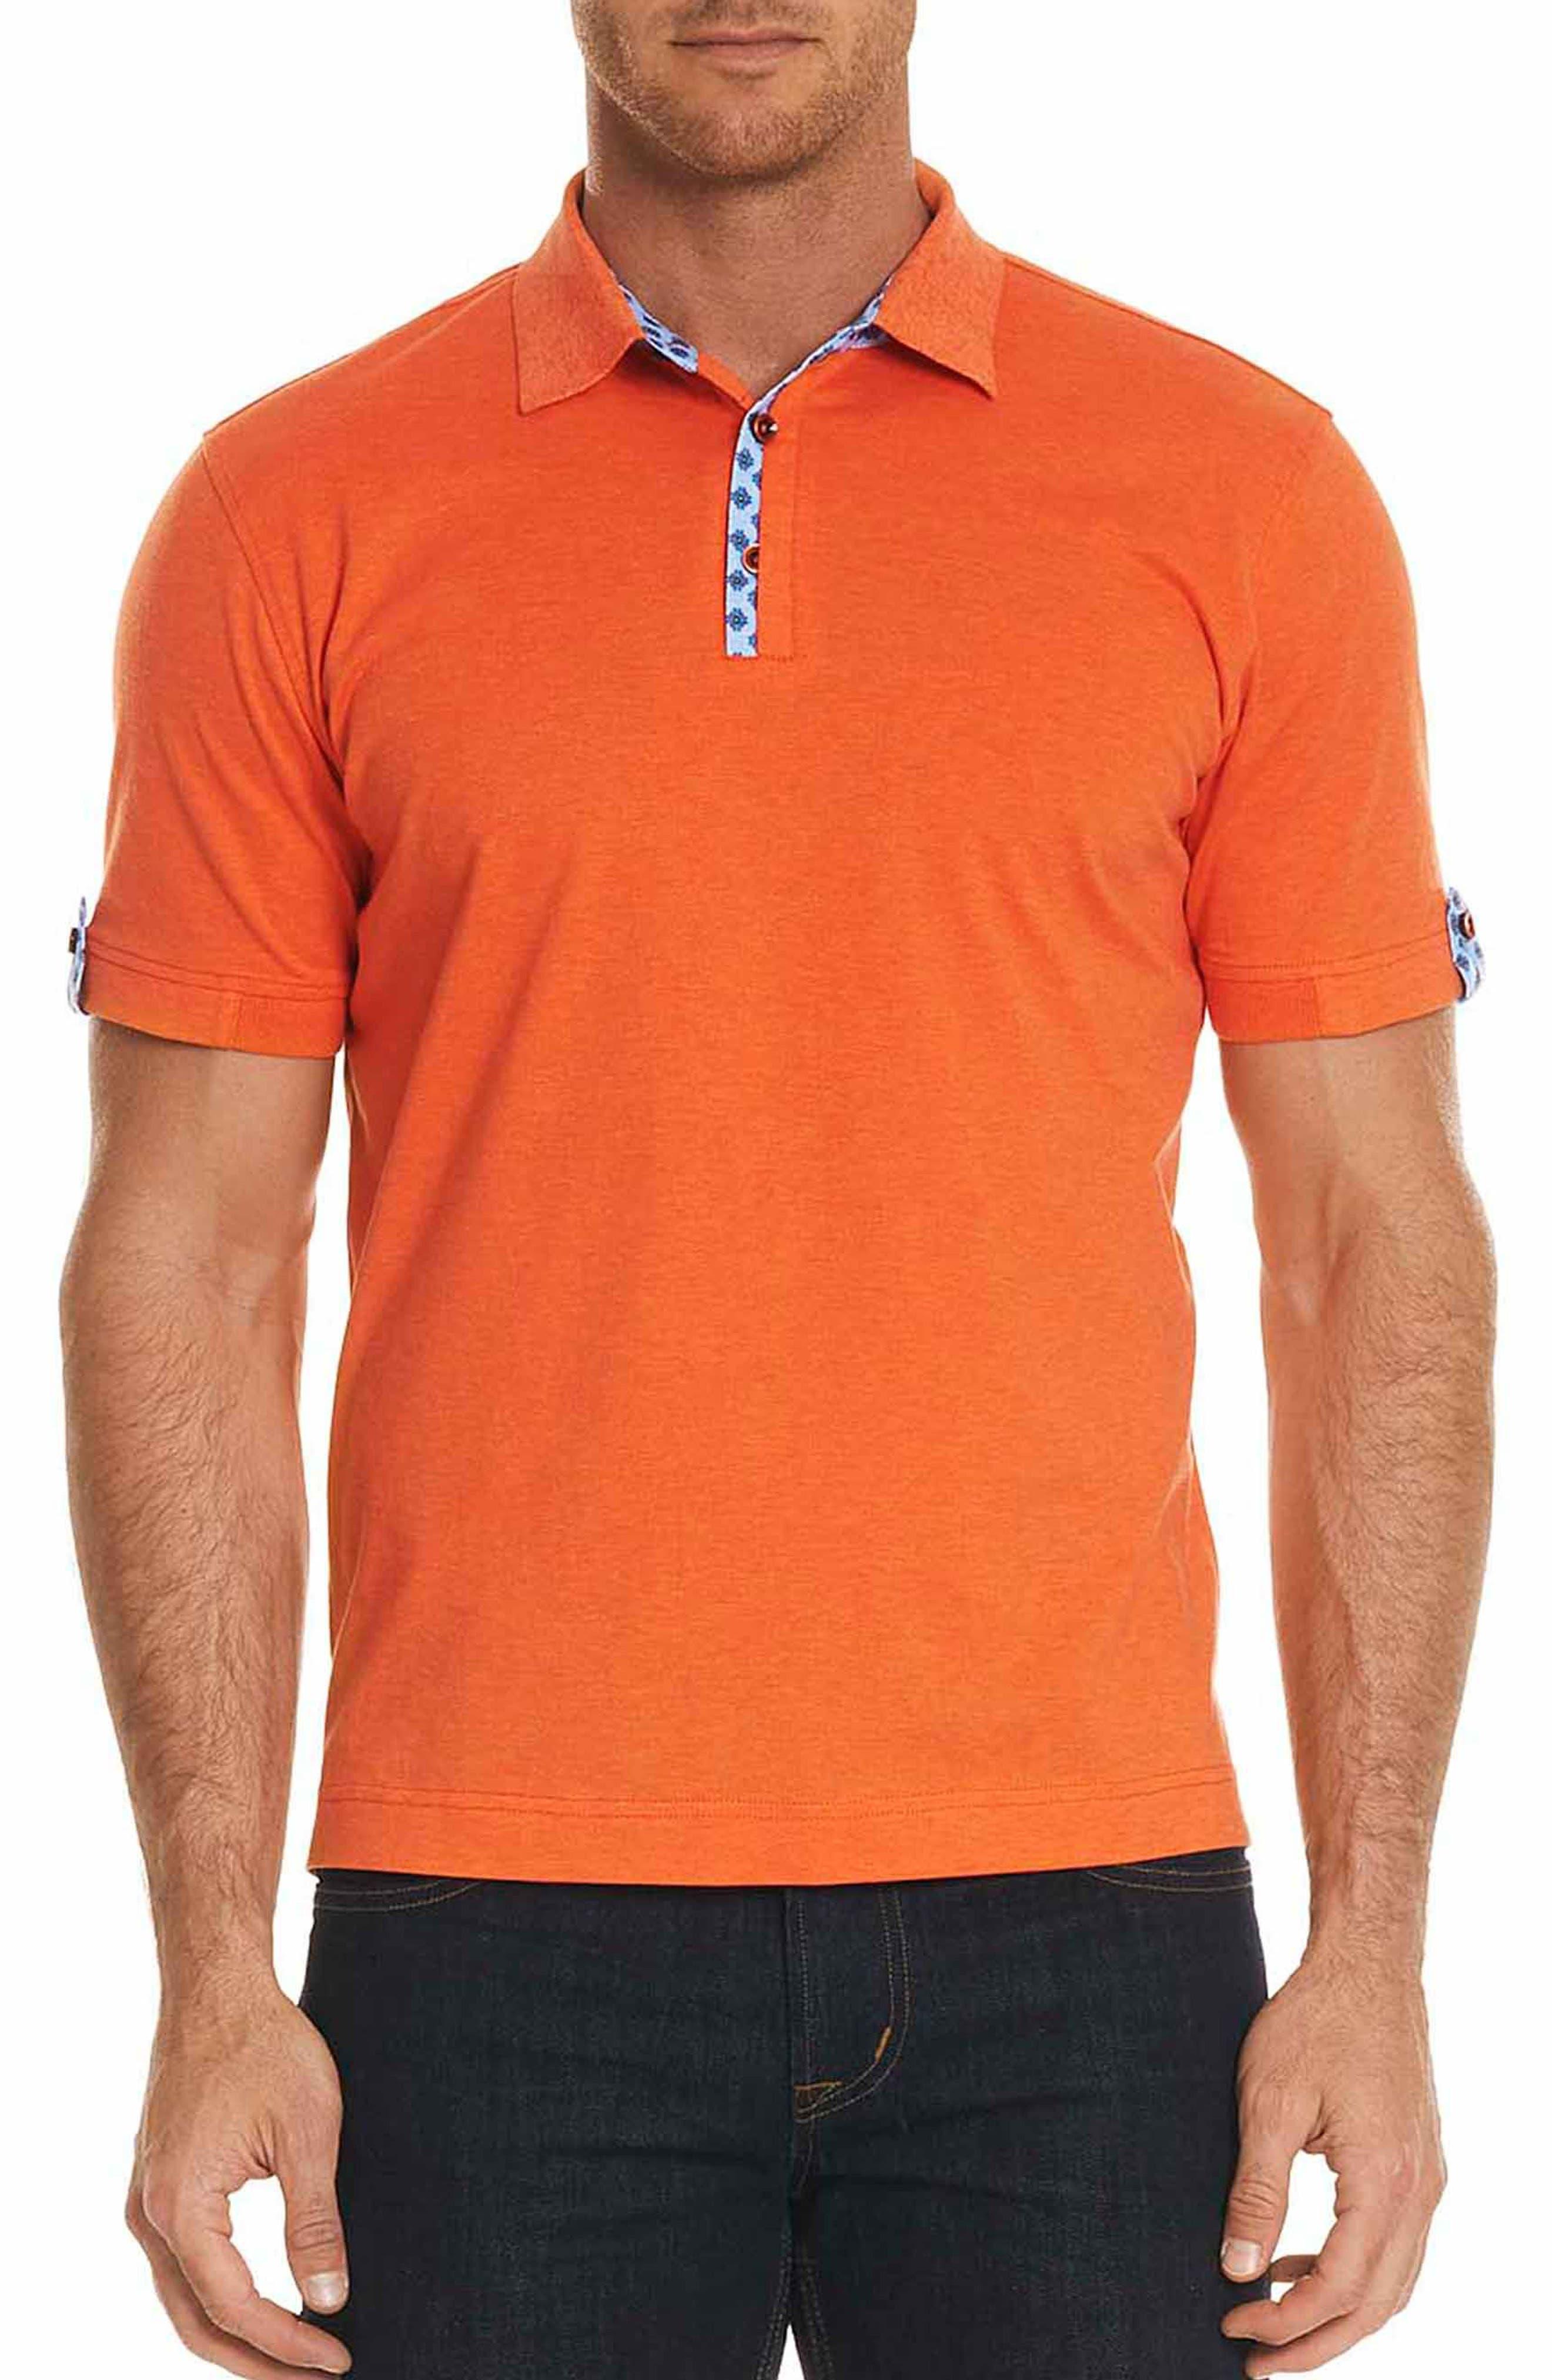 Diego Classic Fit Polo,                         Main,                         color, Orange